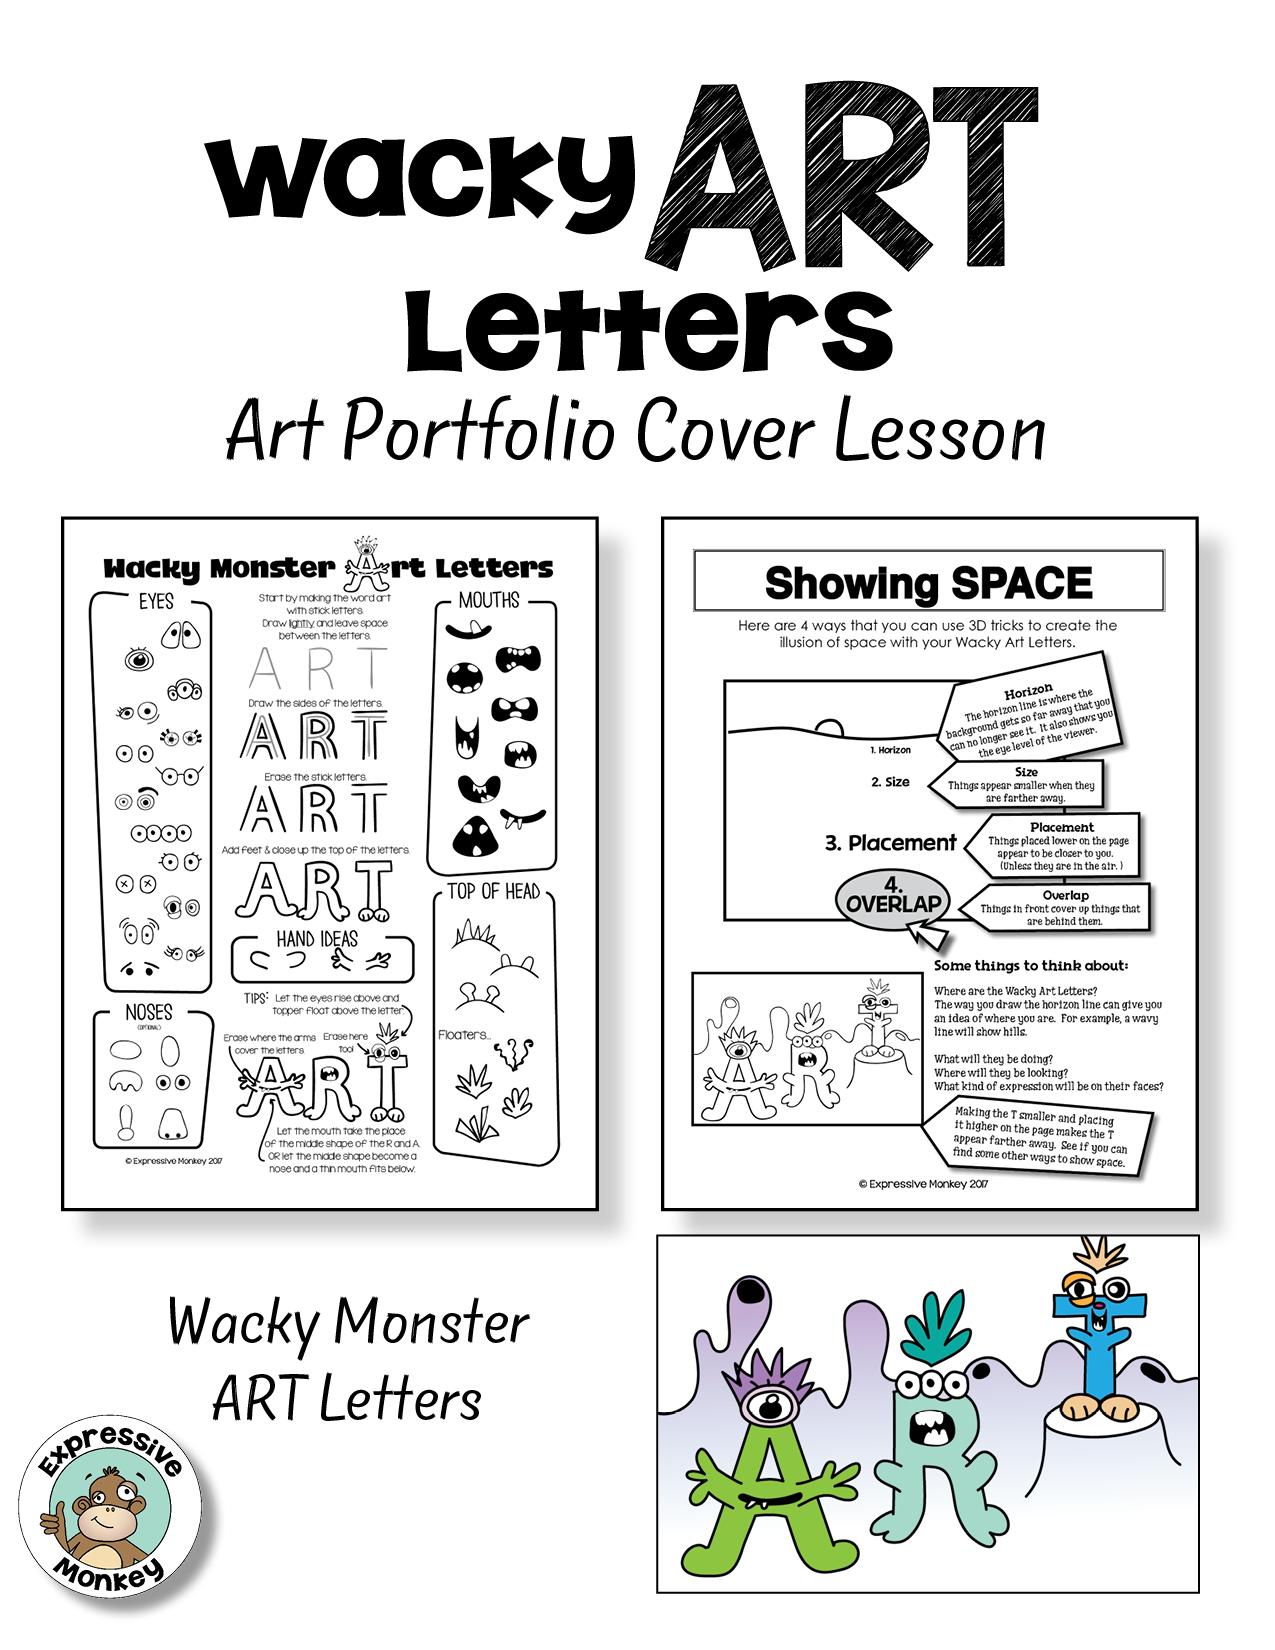 Wacky Art Letters Art Portfolio Cover Lesson